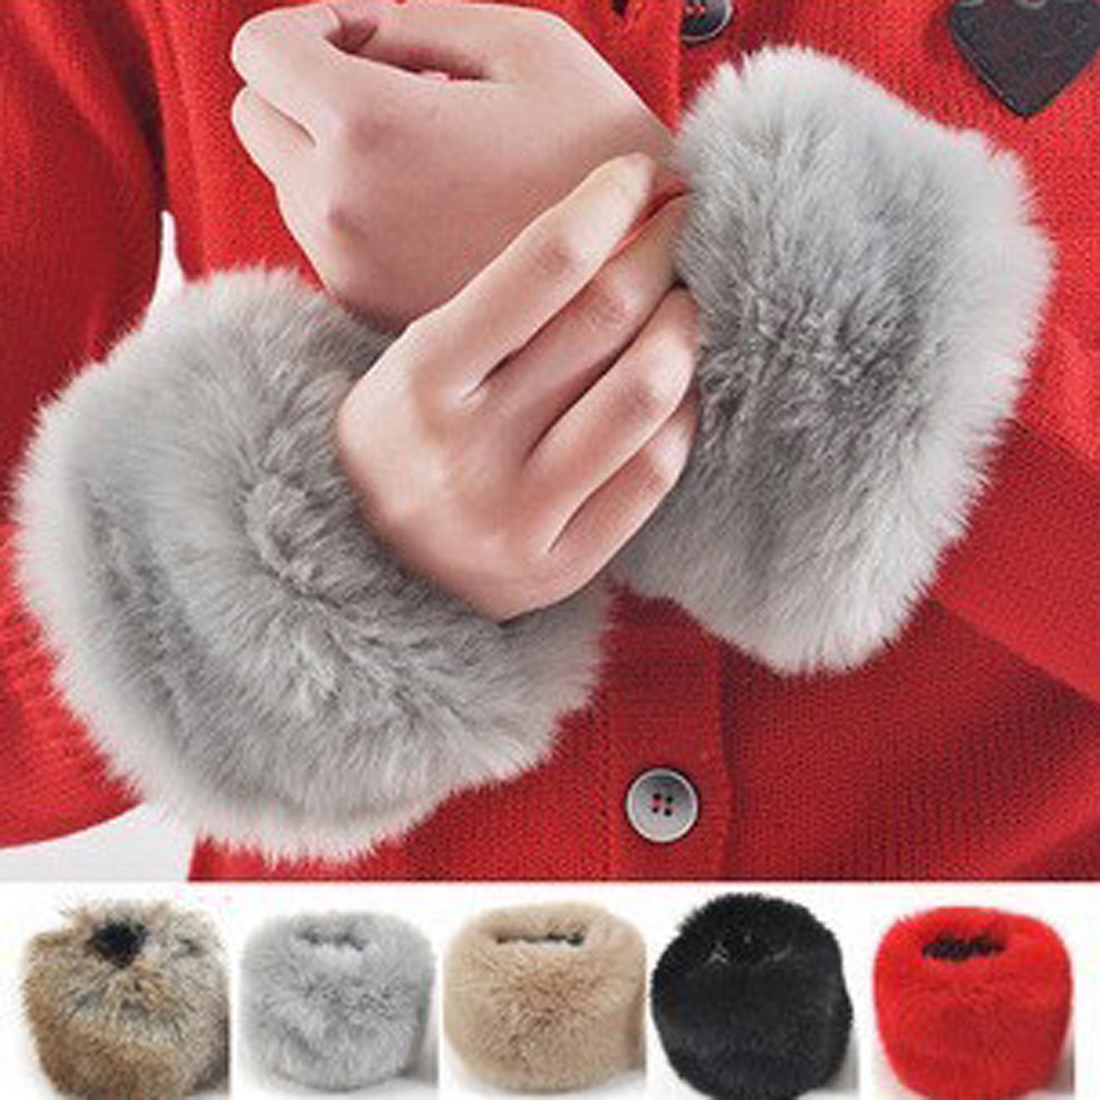 Fashion Winter Warm Women Faux Fur Elastic  Gloves Wrist  ProtectorArms Warmer Slap On Cuffs Warmer Plush Windproof  Elastic